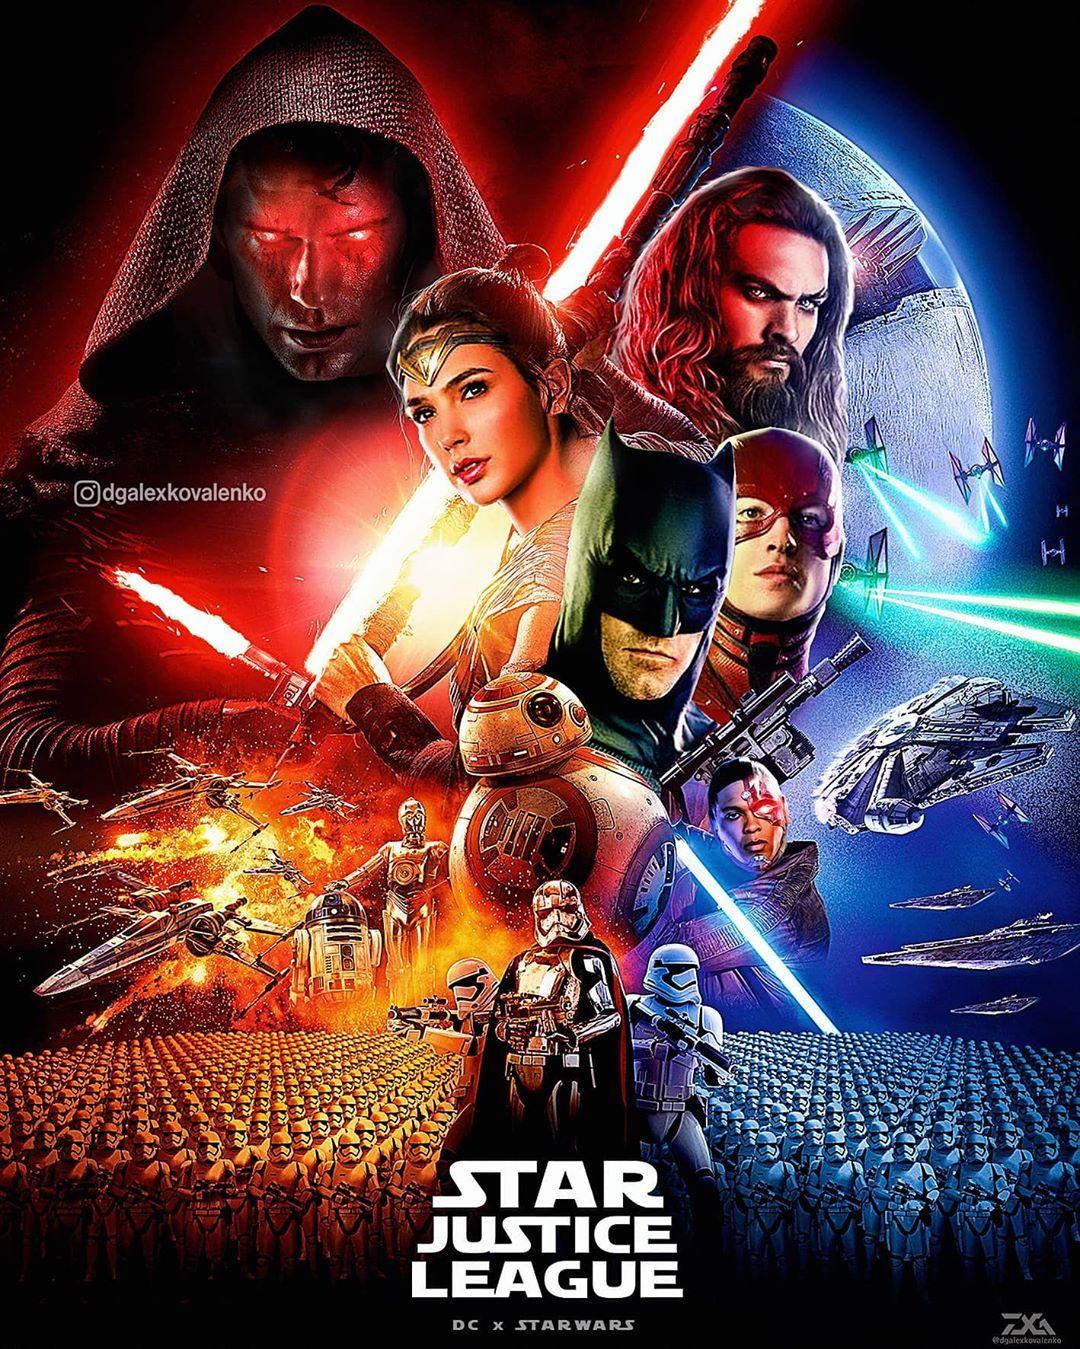 Polubienia 123 Komentarze 5 Alexander Kovalenko Dgalexkovalenko Na Instagramie Star Justice League We Continue To Coll Super Heroi Herois Fas